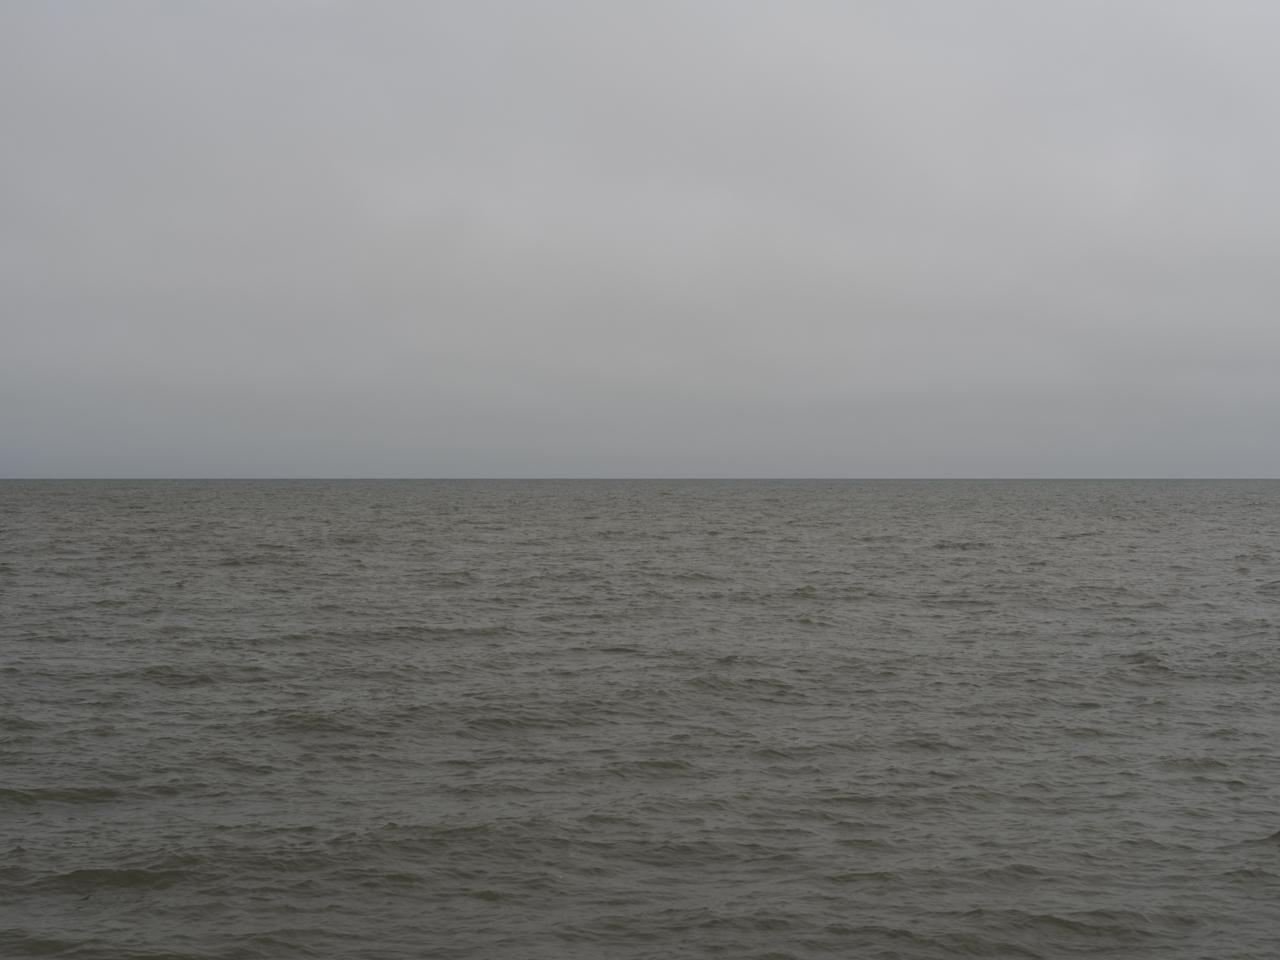 a slate gray sky over muddy green waters on Lake Michigan